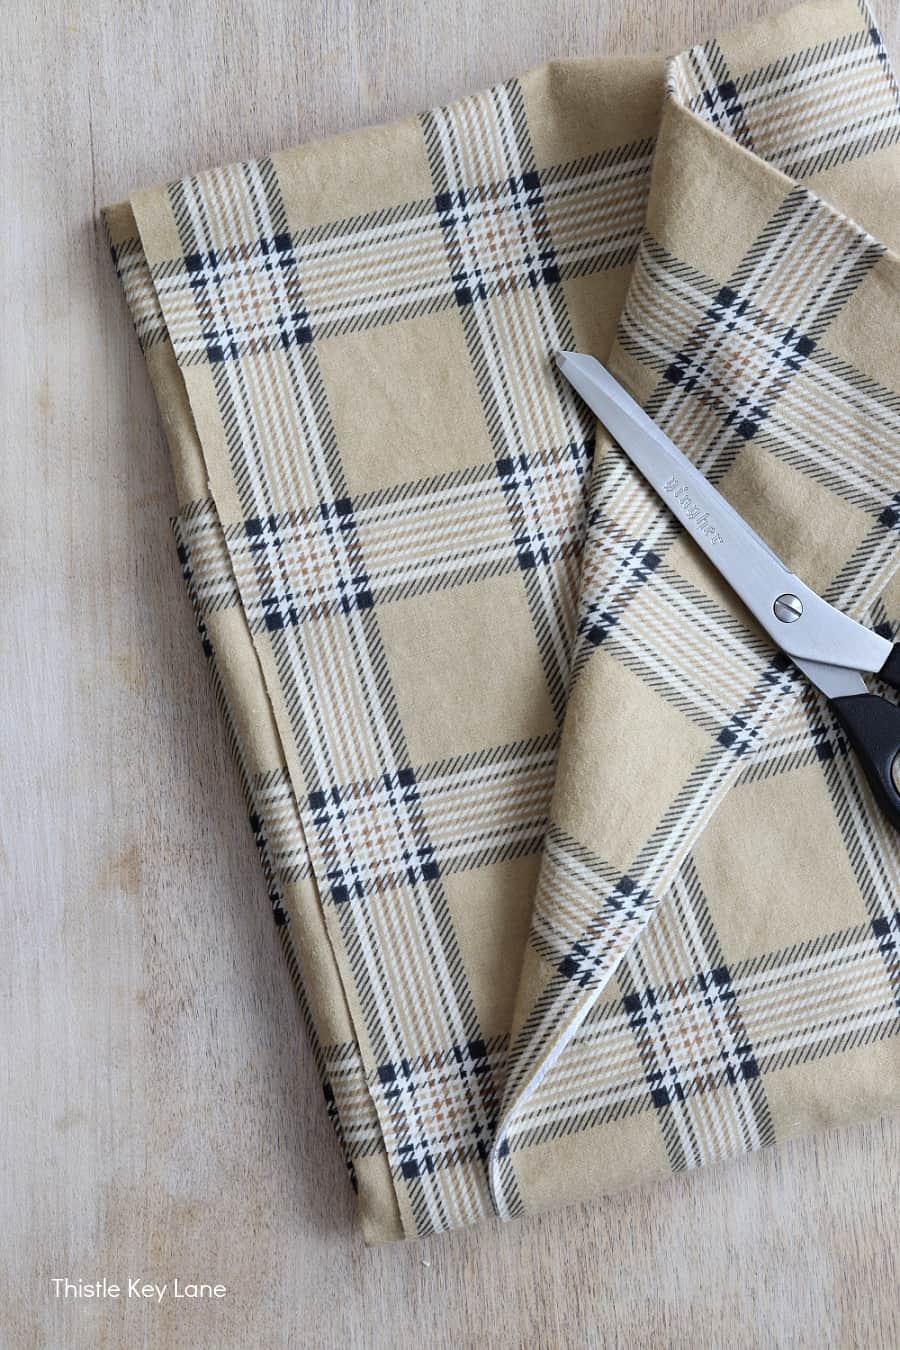 Plaid fabric with scissors.